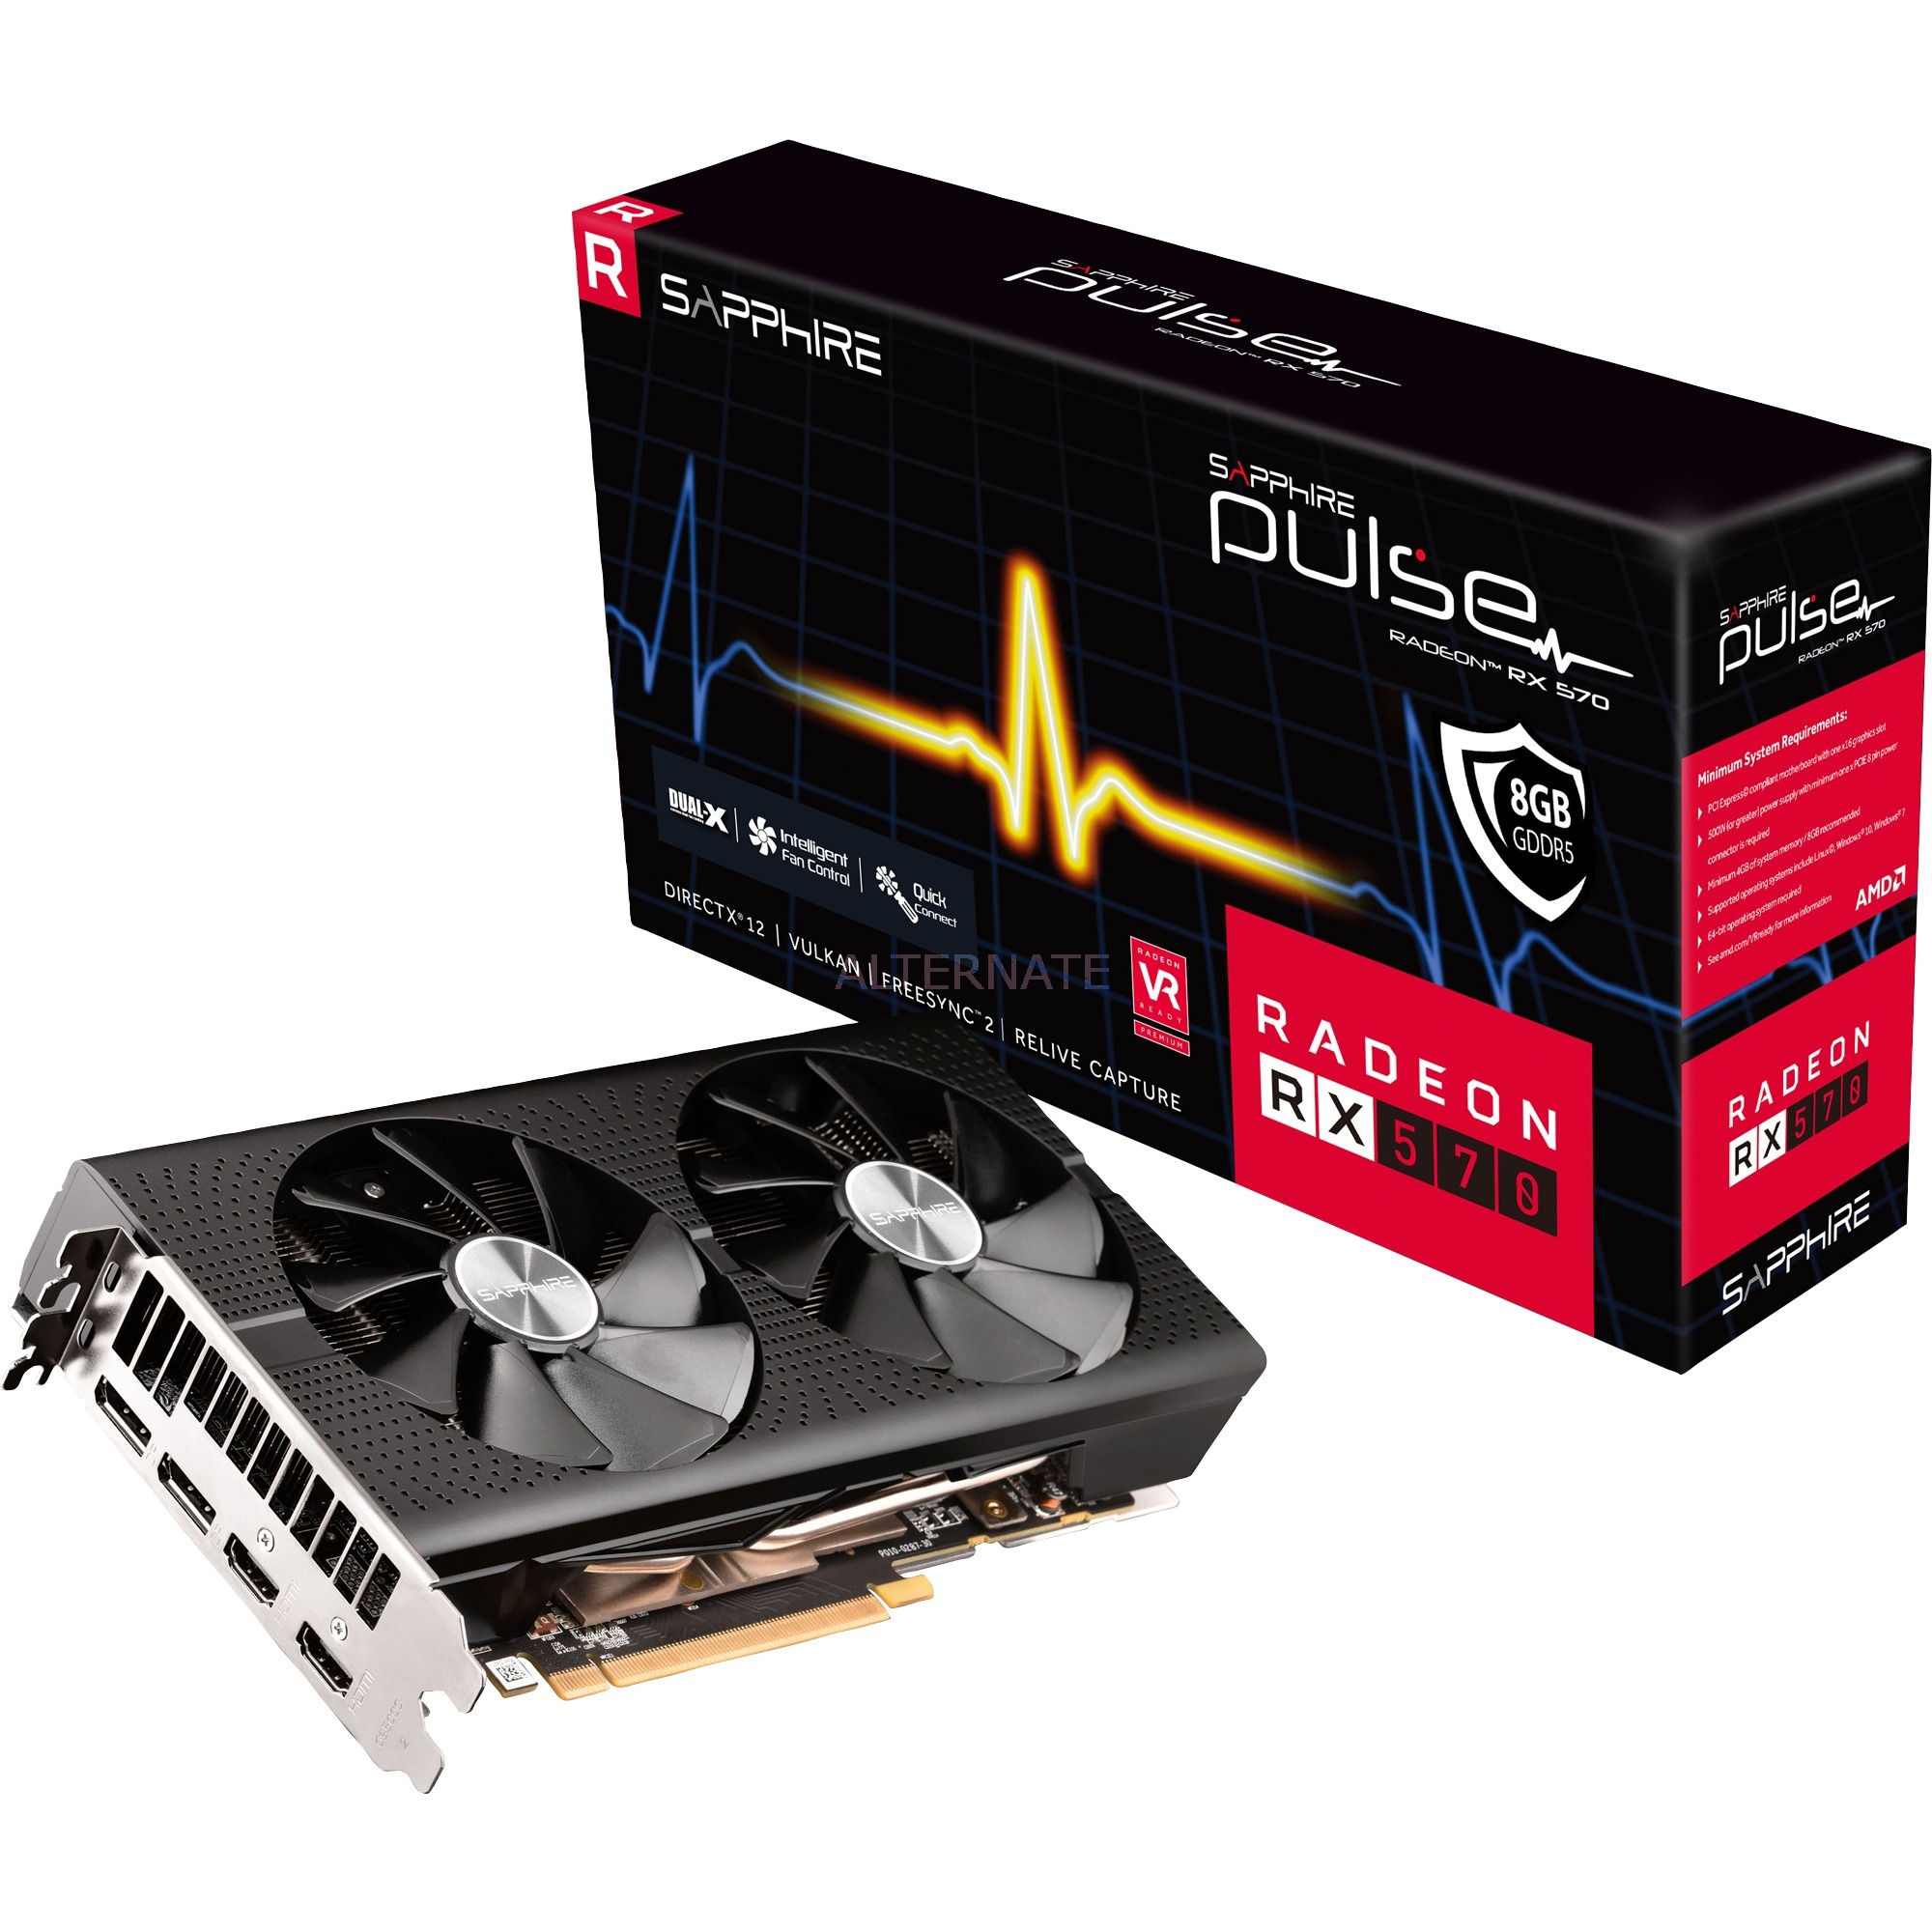 Radeon RX 570 PULSE, Tarjeta gráfica